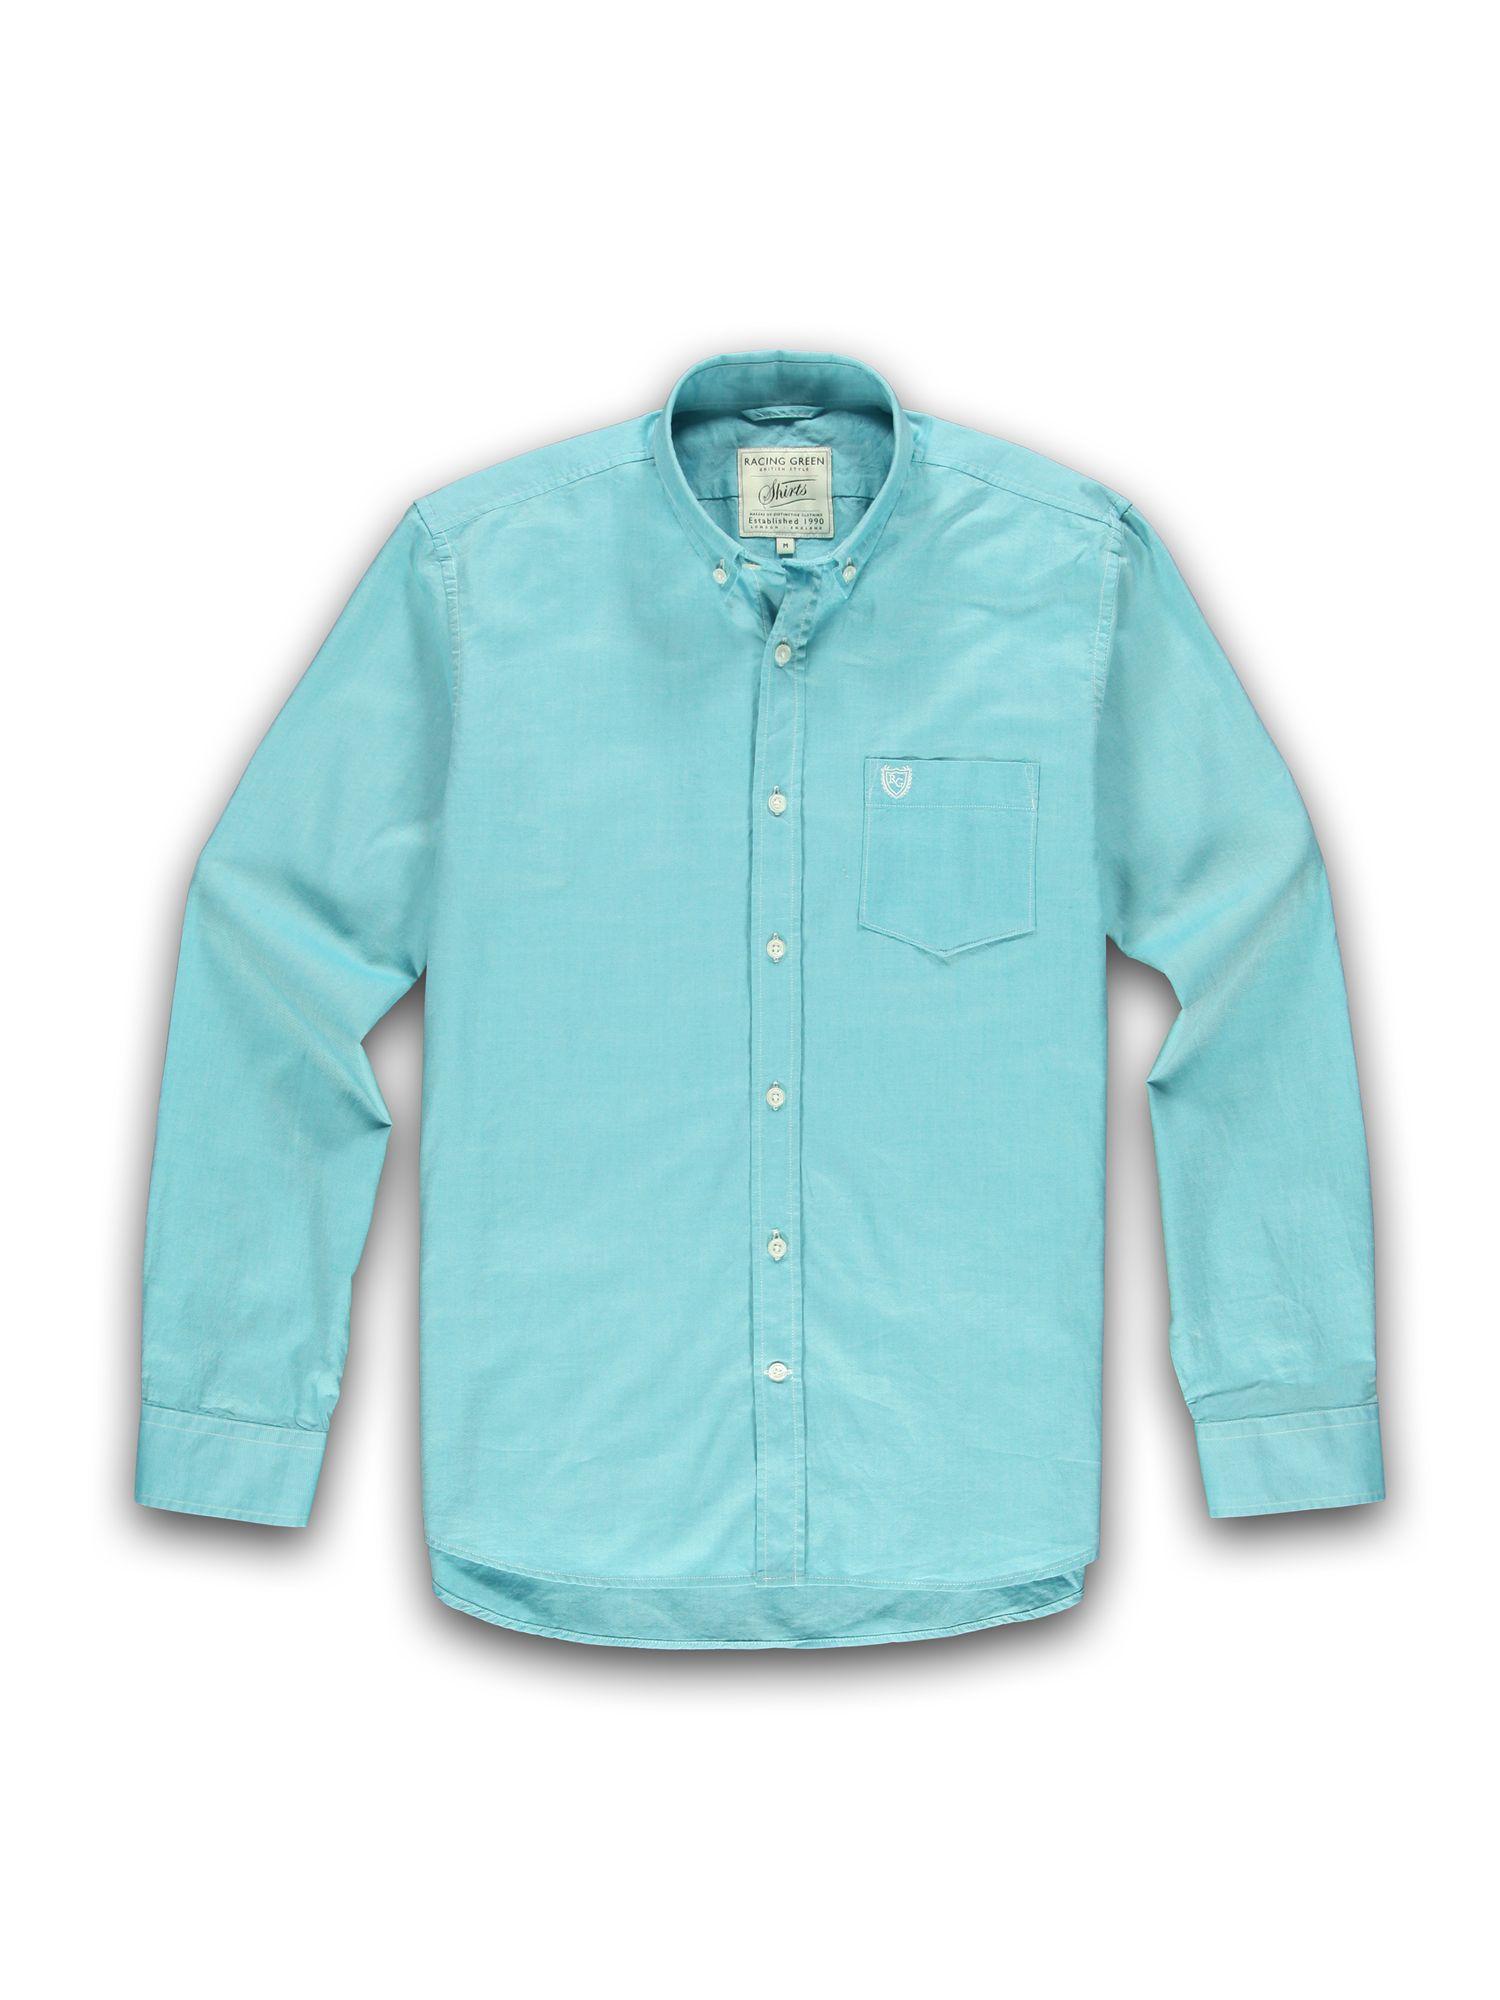 Racing Green Long Sleeve Button Down Collar Shirt In Blue